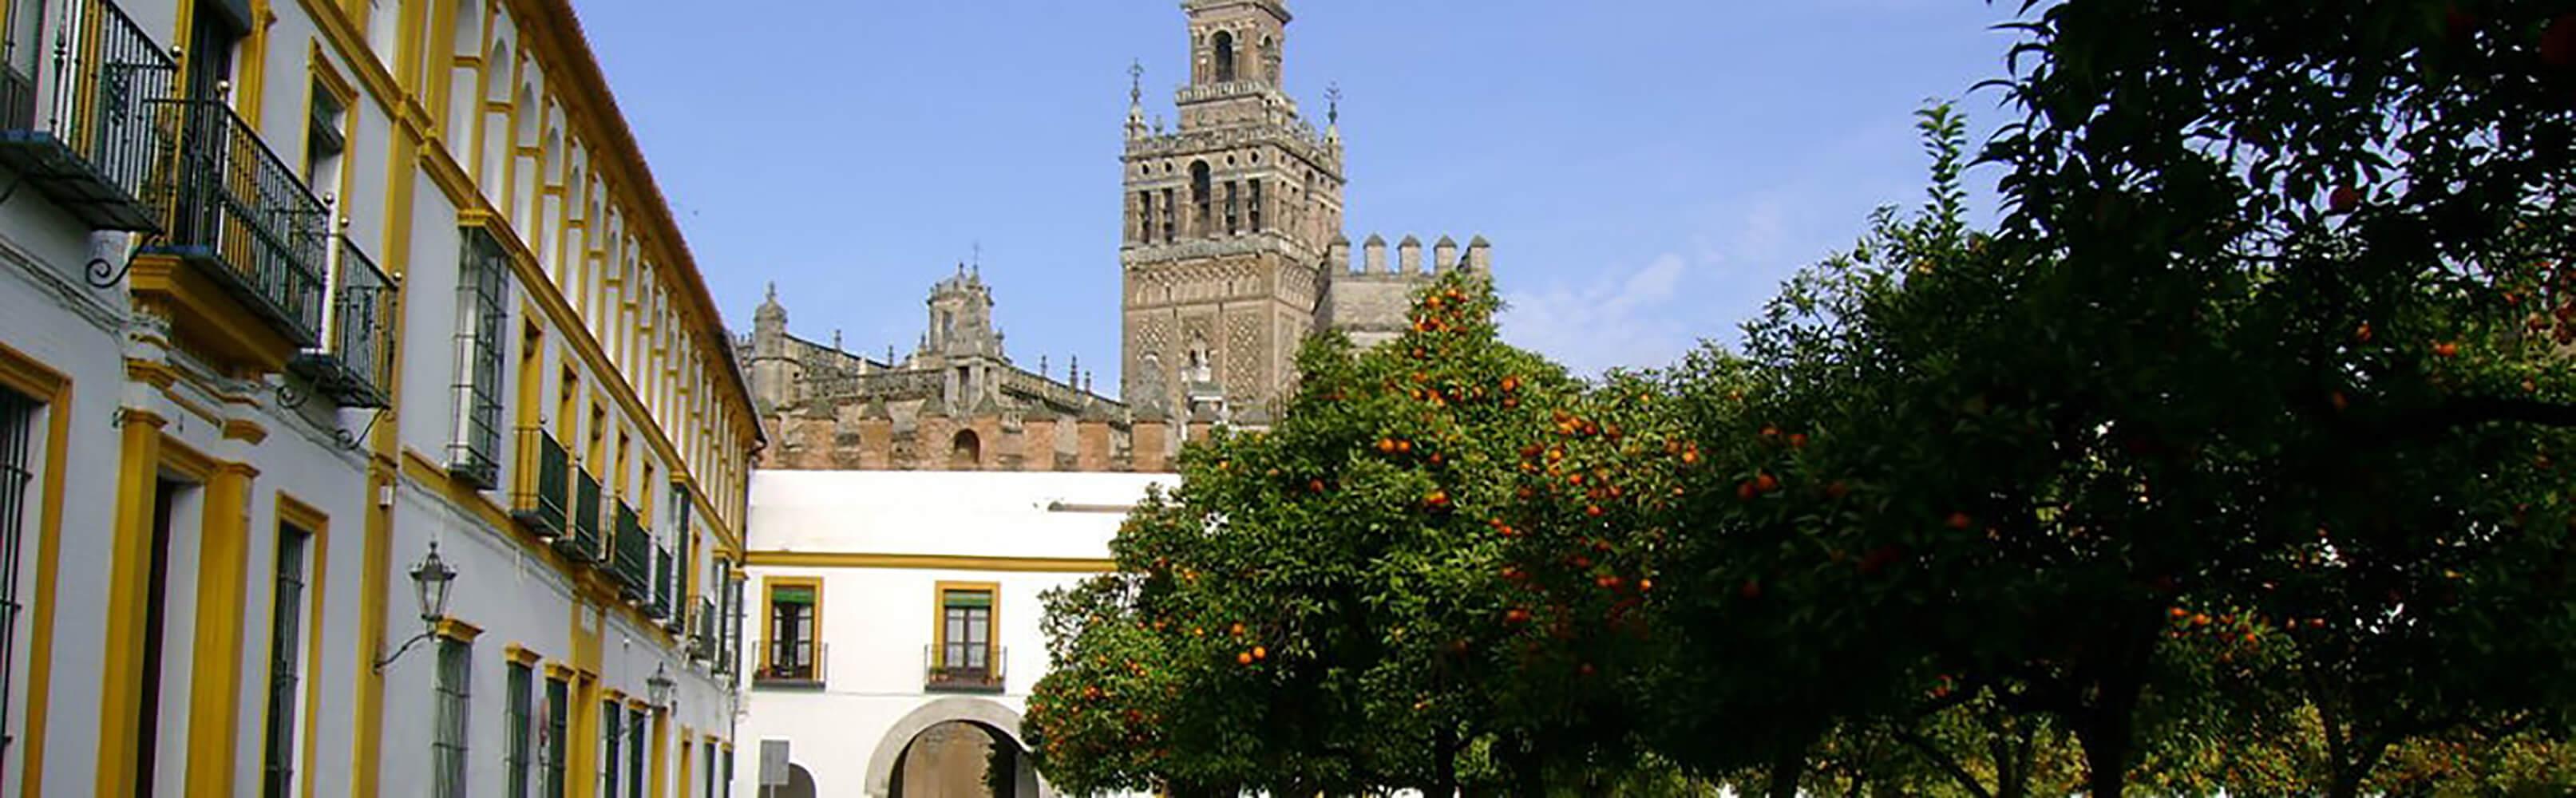 Reales Alcázares de Sevilla 1